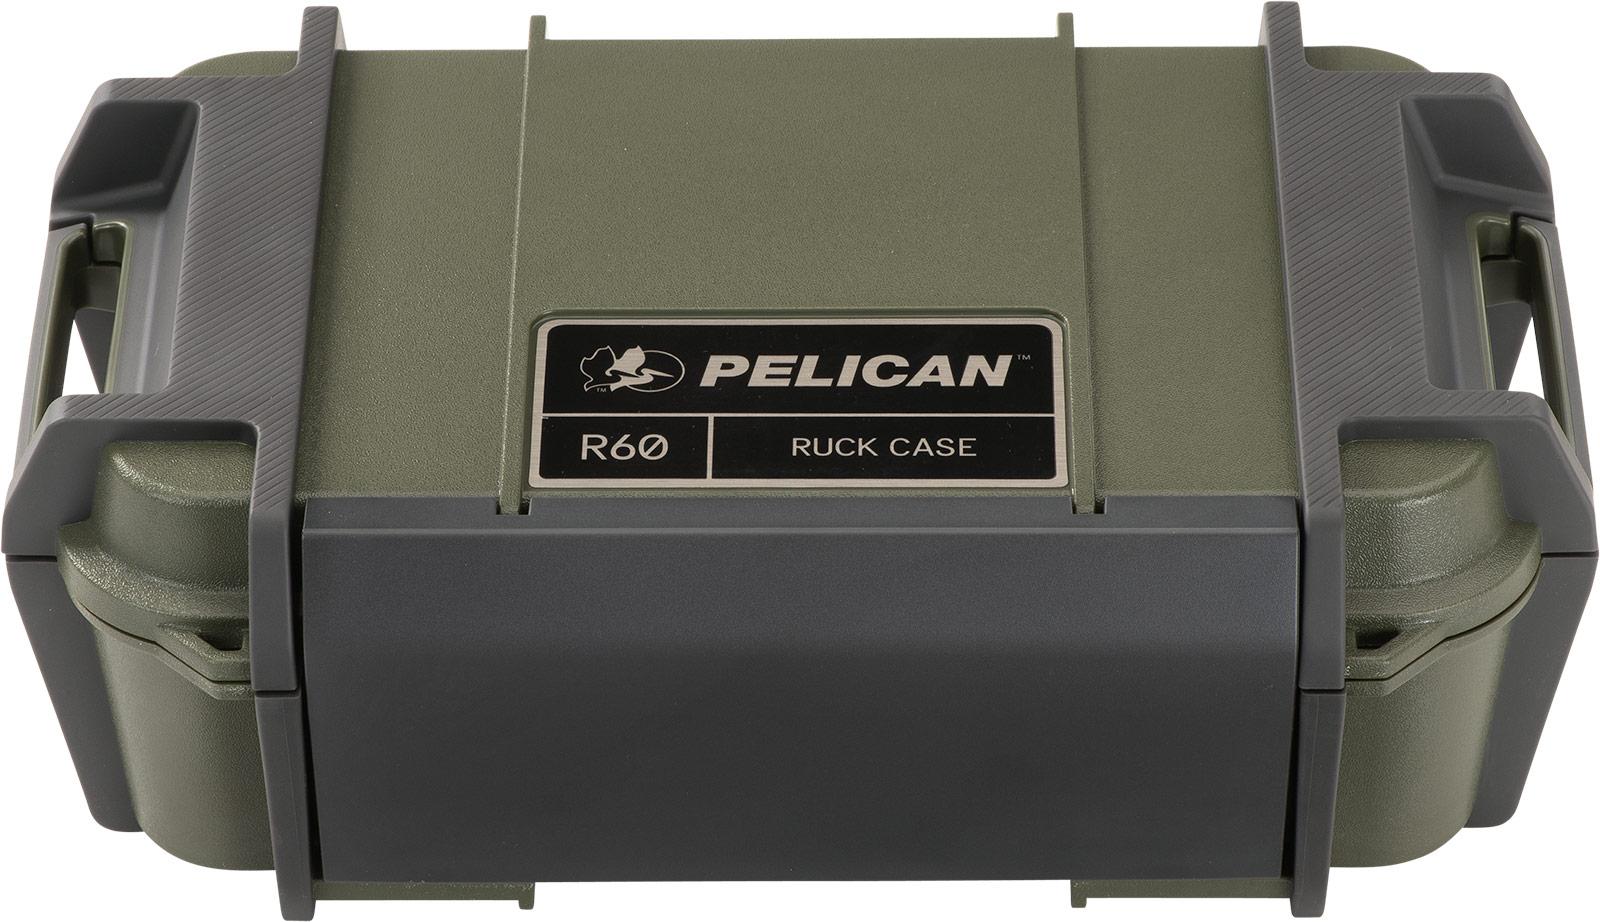 pelican ruck r60 rugged smartphone case